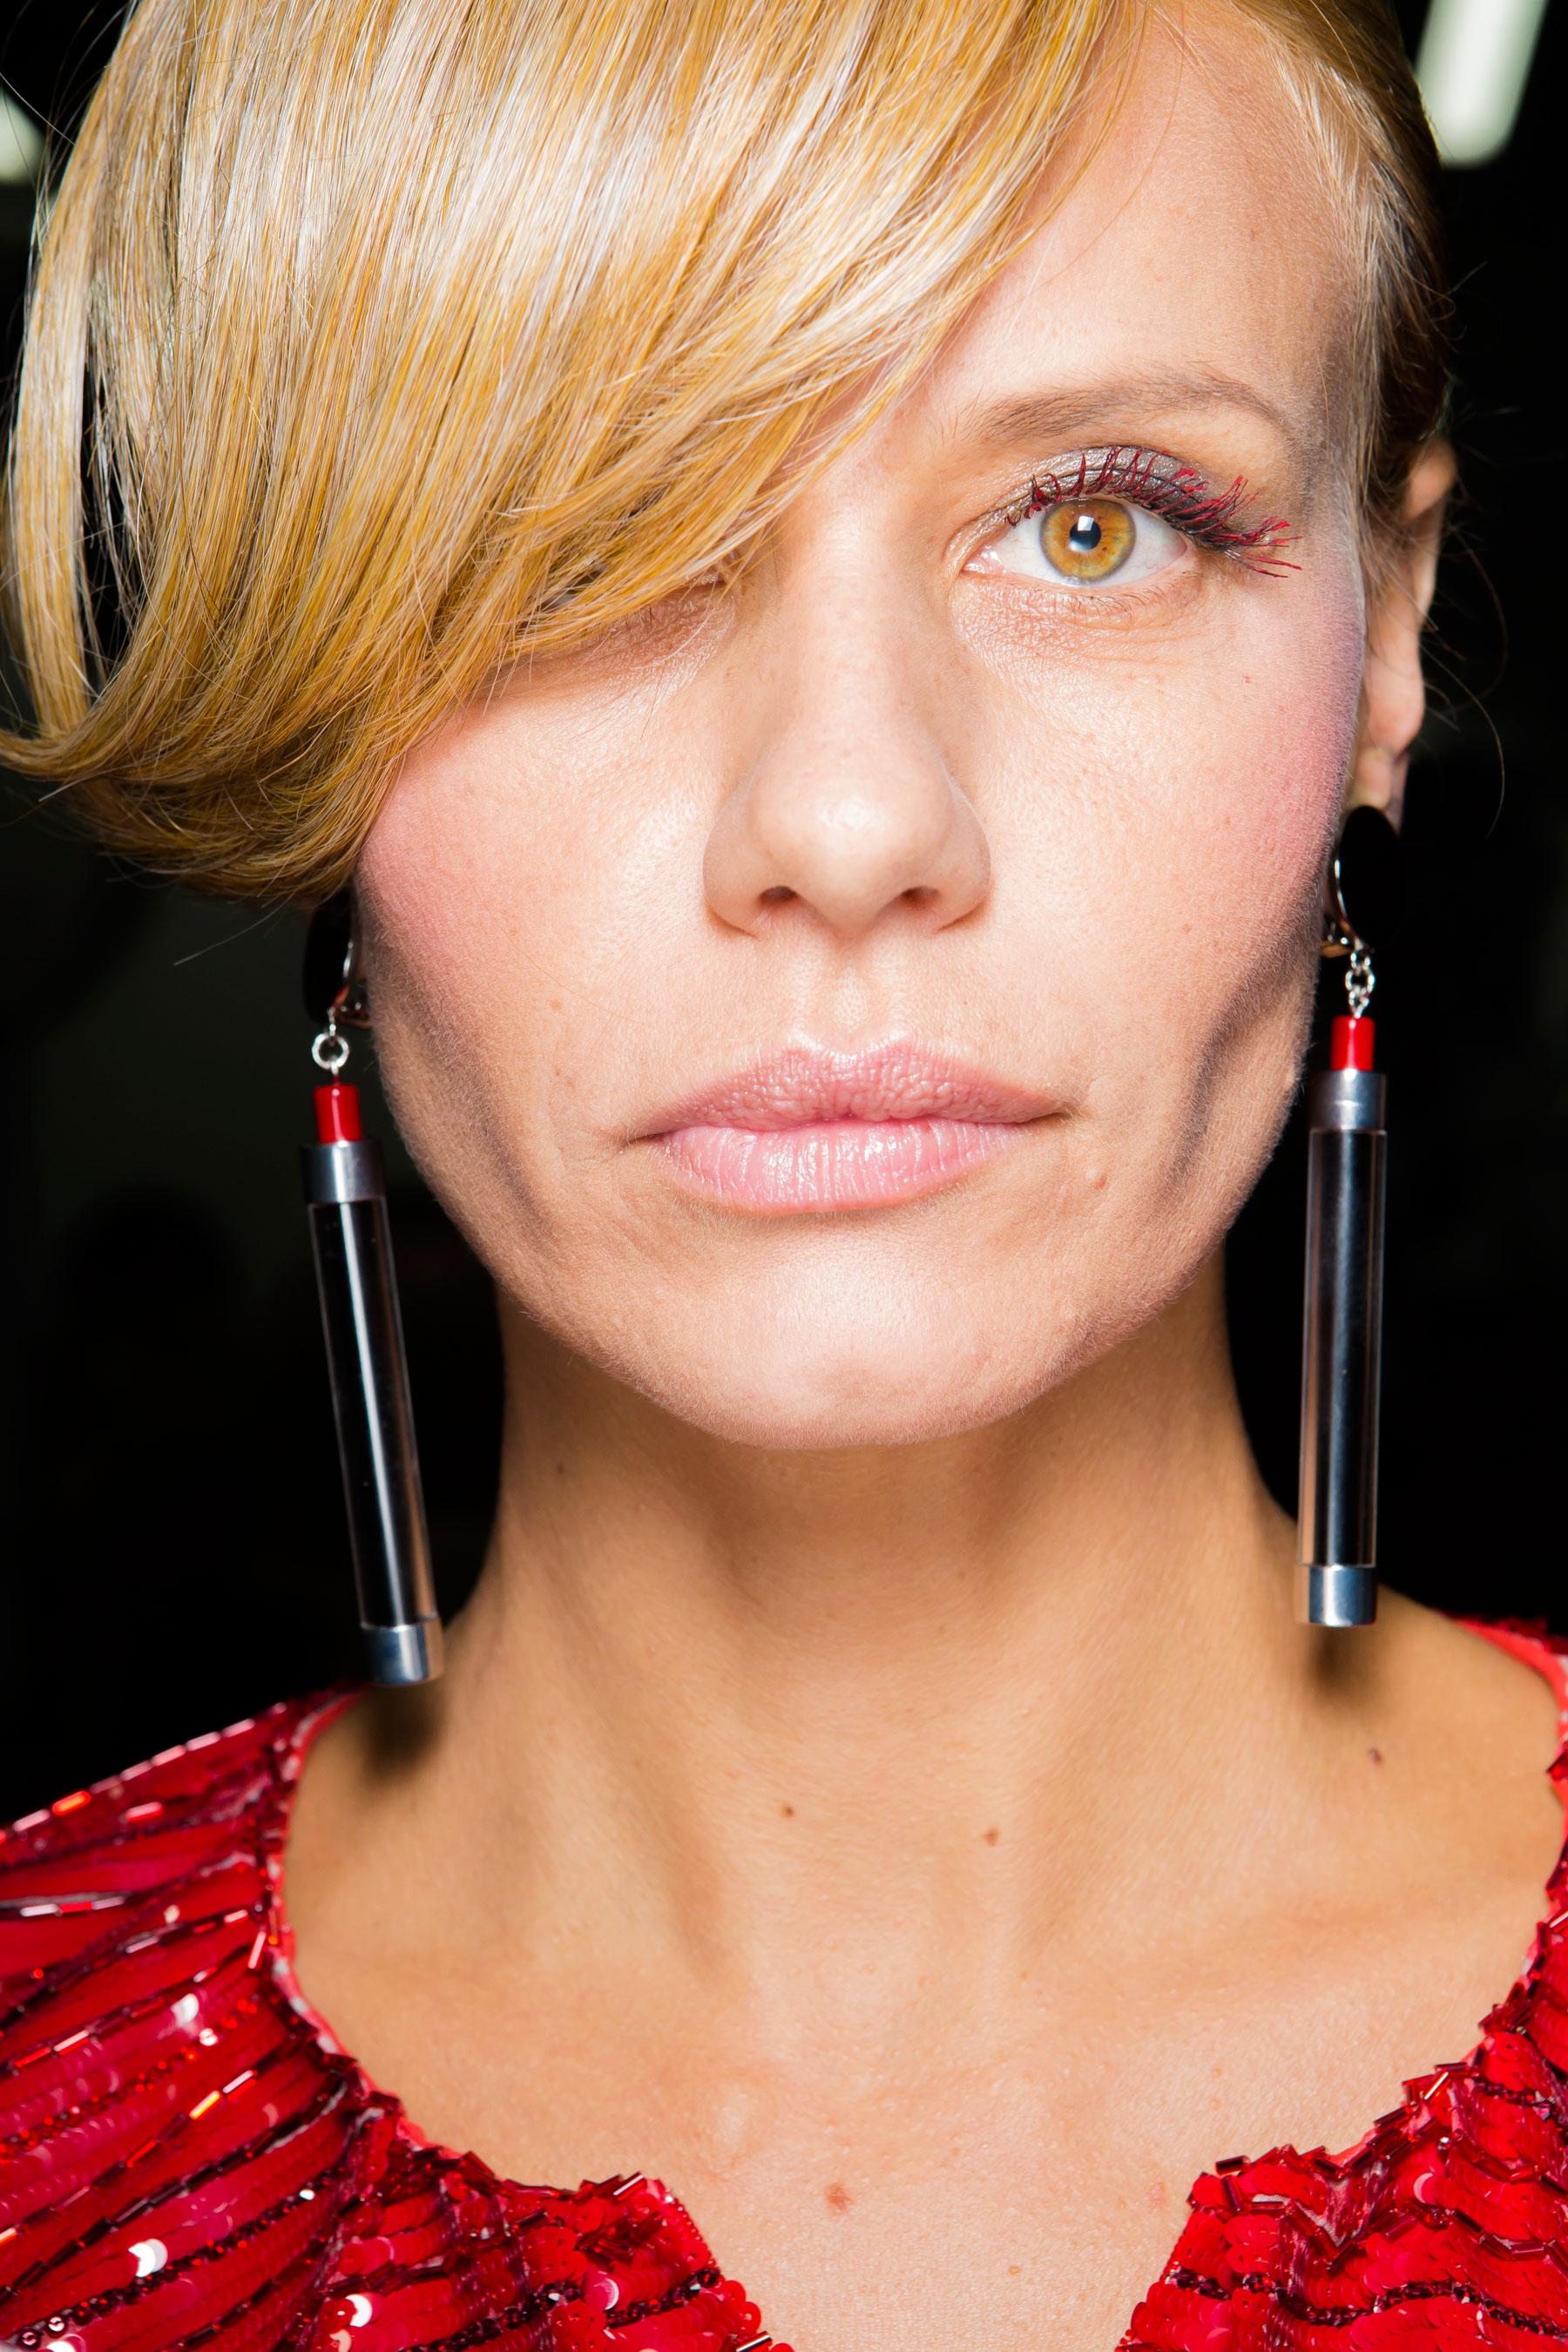 giorgio-armani-spring-2016-beauty-fashion-show-the-impression-24